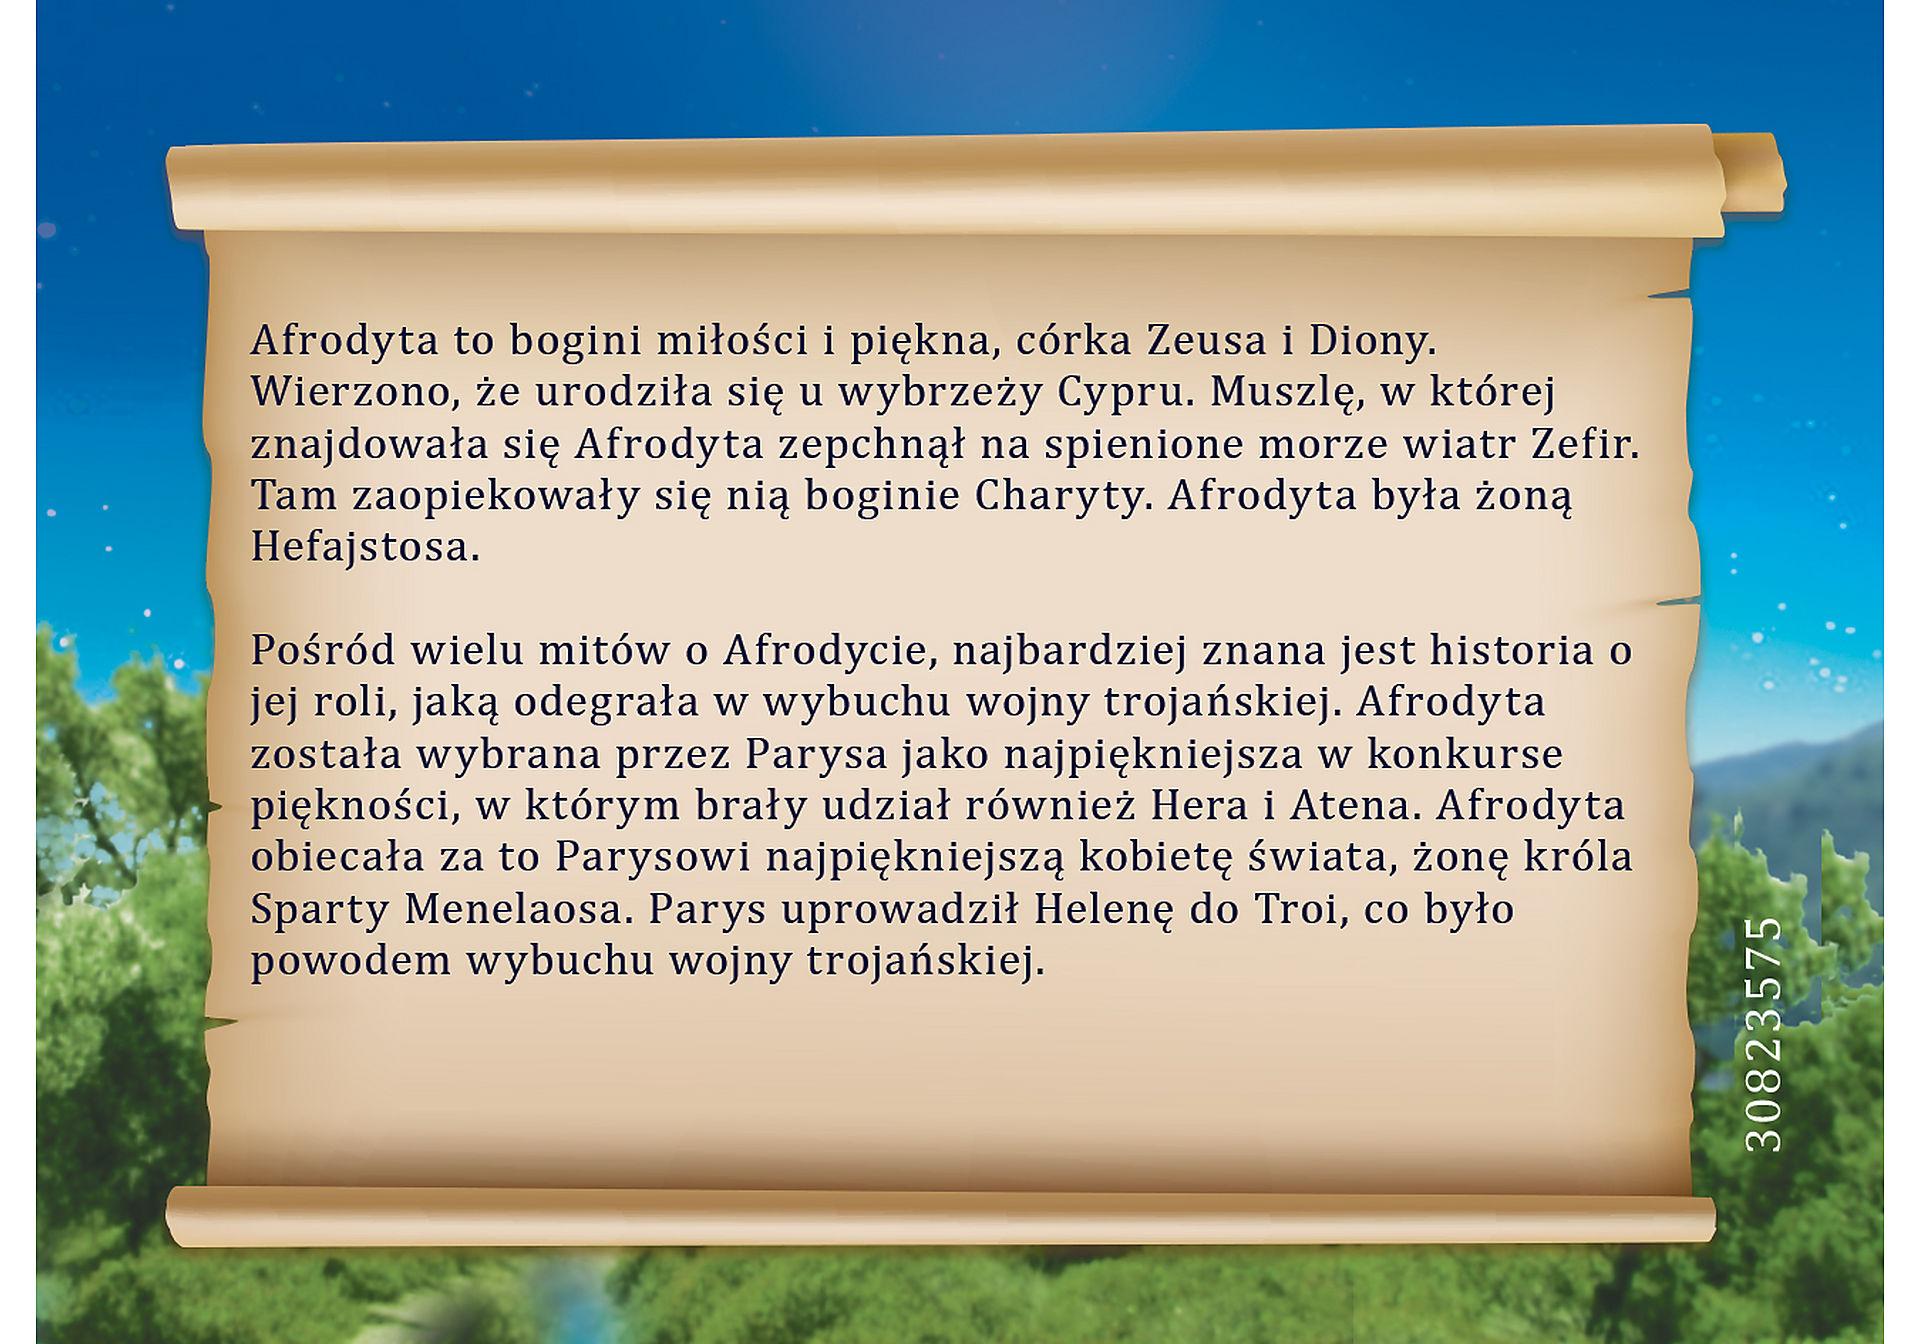 70213 Afrodyta zoom image5